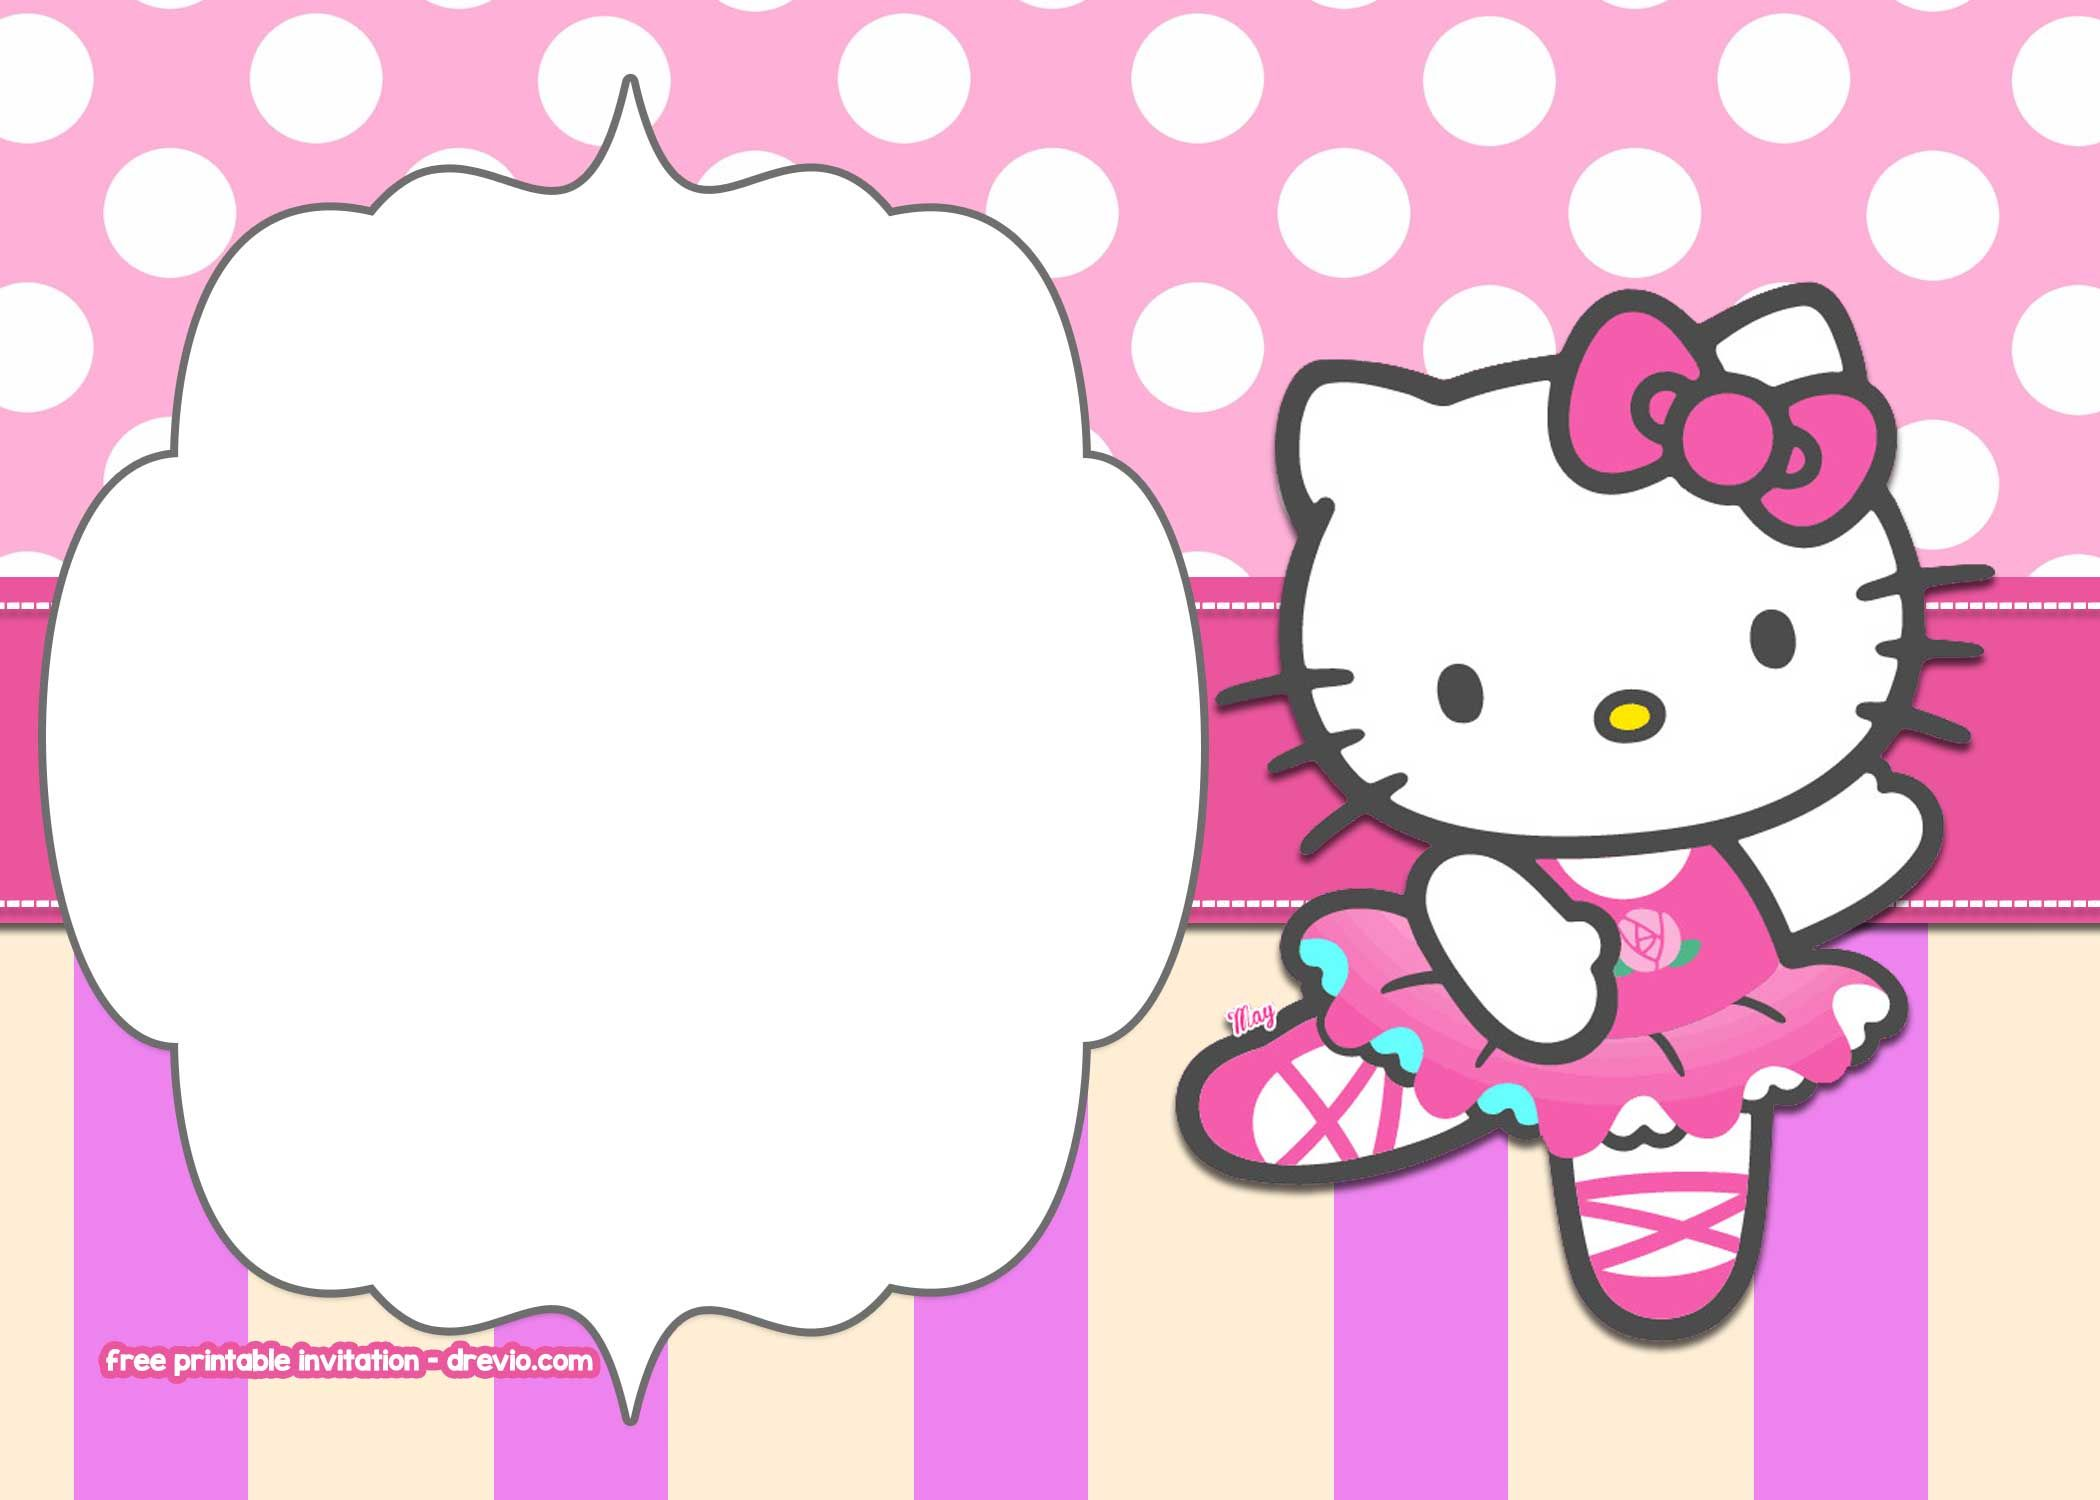 polka dot invitation templates